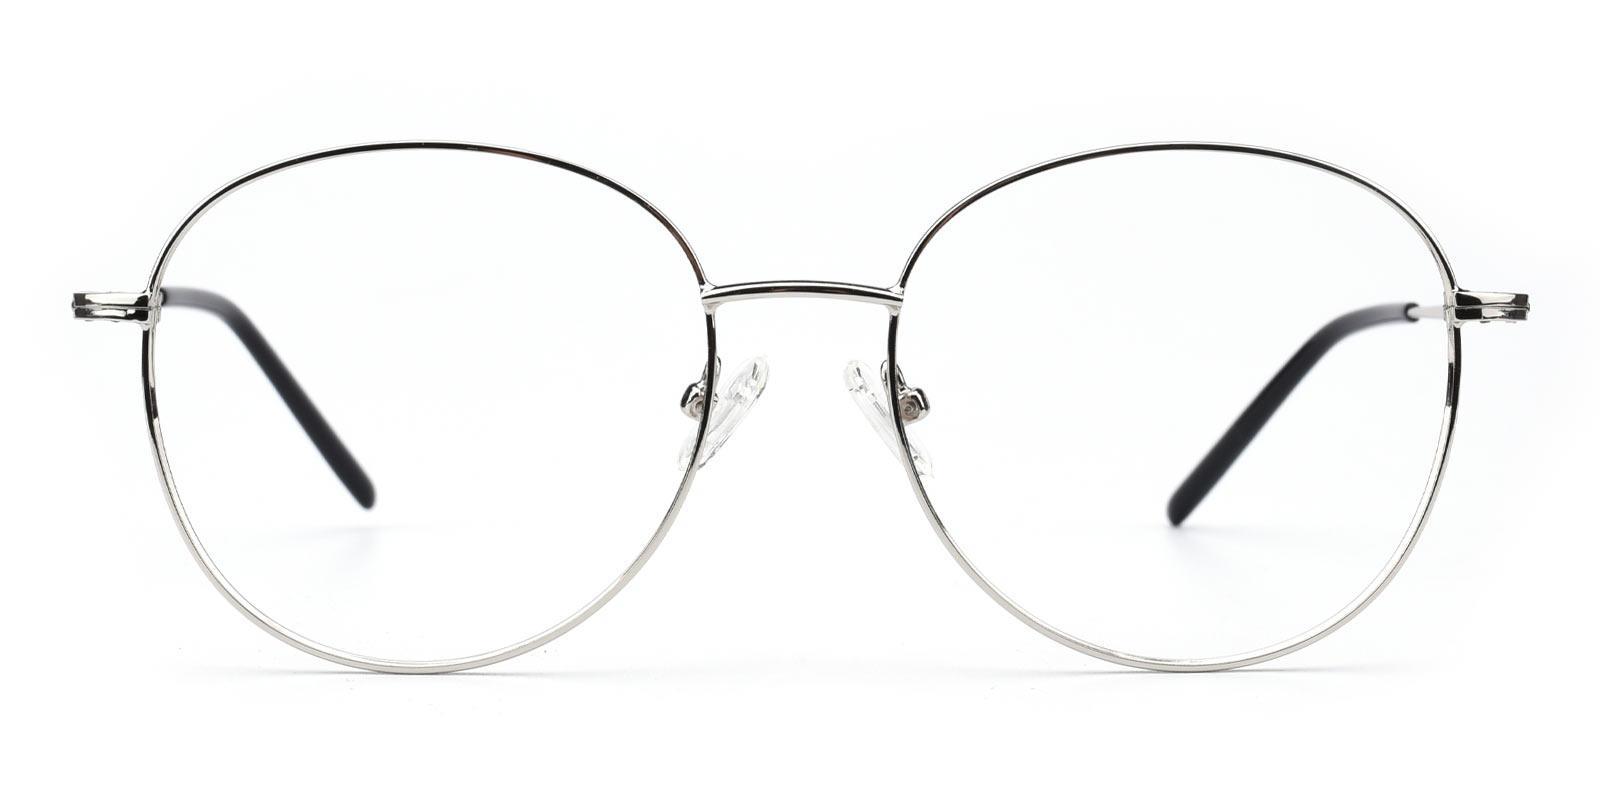 Damla-Silver-Round-Metal-Eyeglasses-additional2